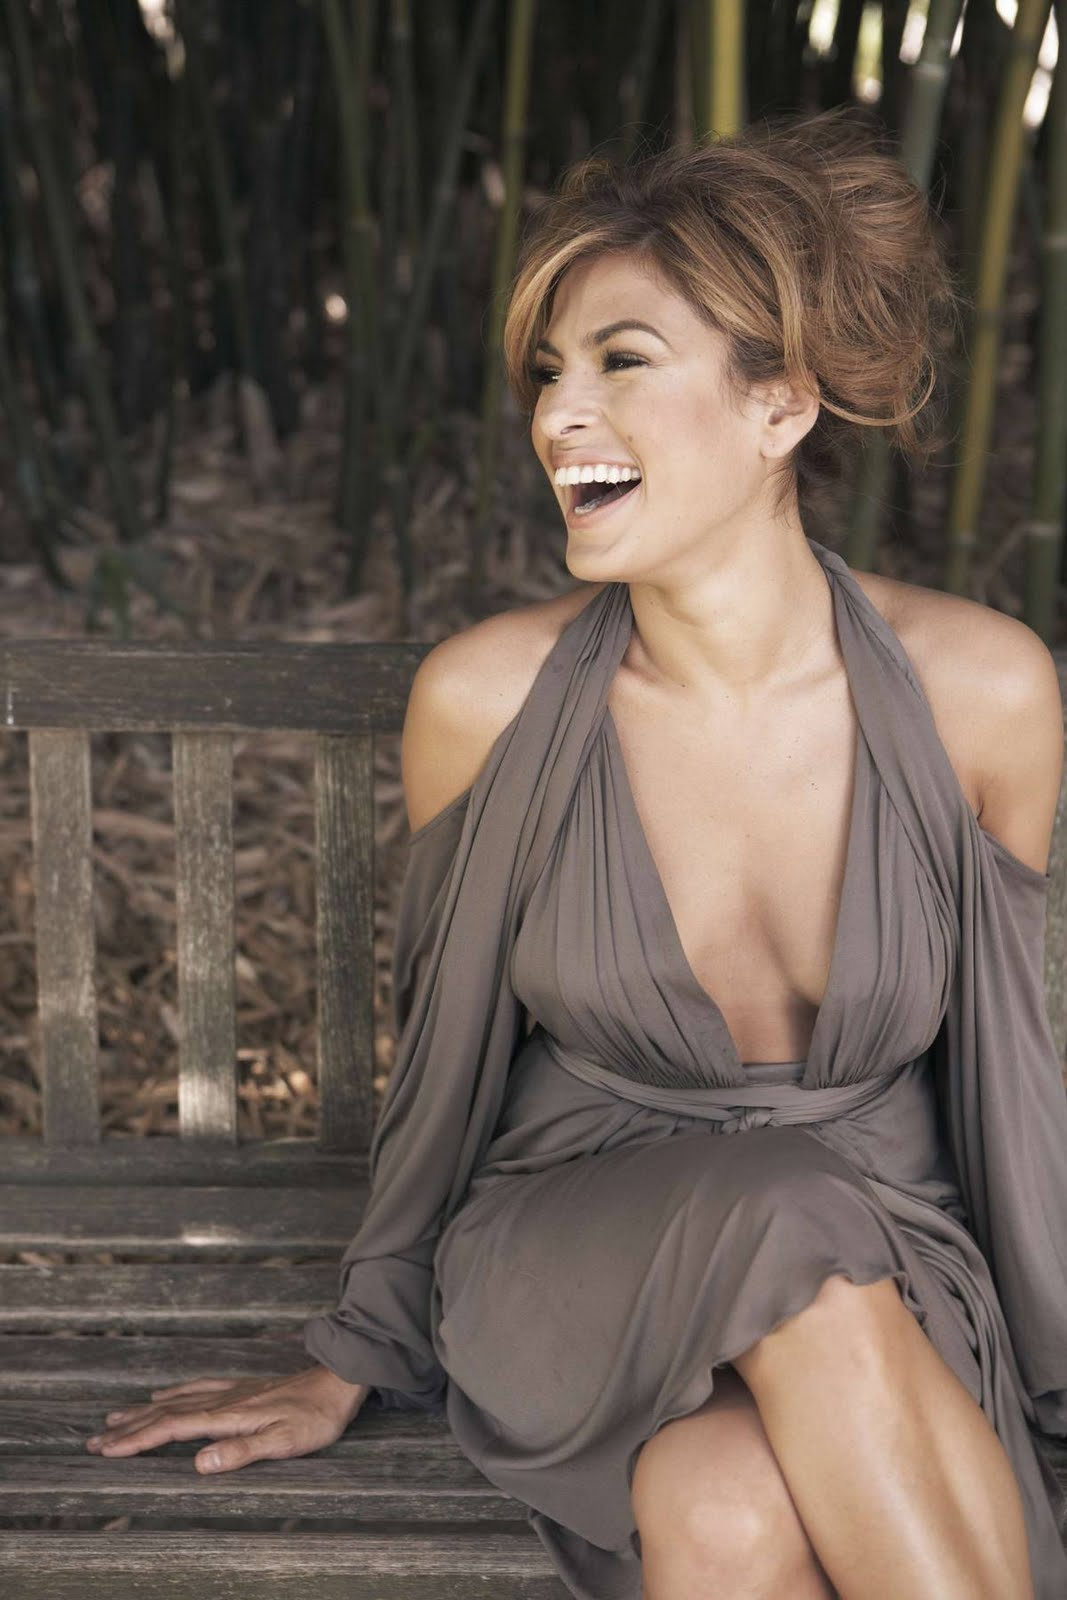 Eva Mendes: Eva Mendes Hot Stills